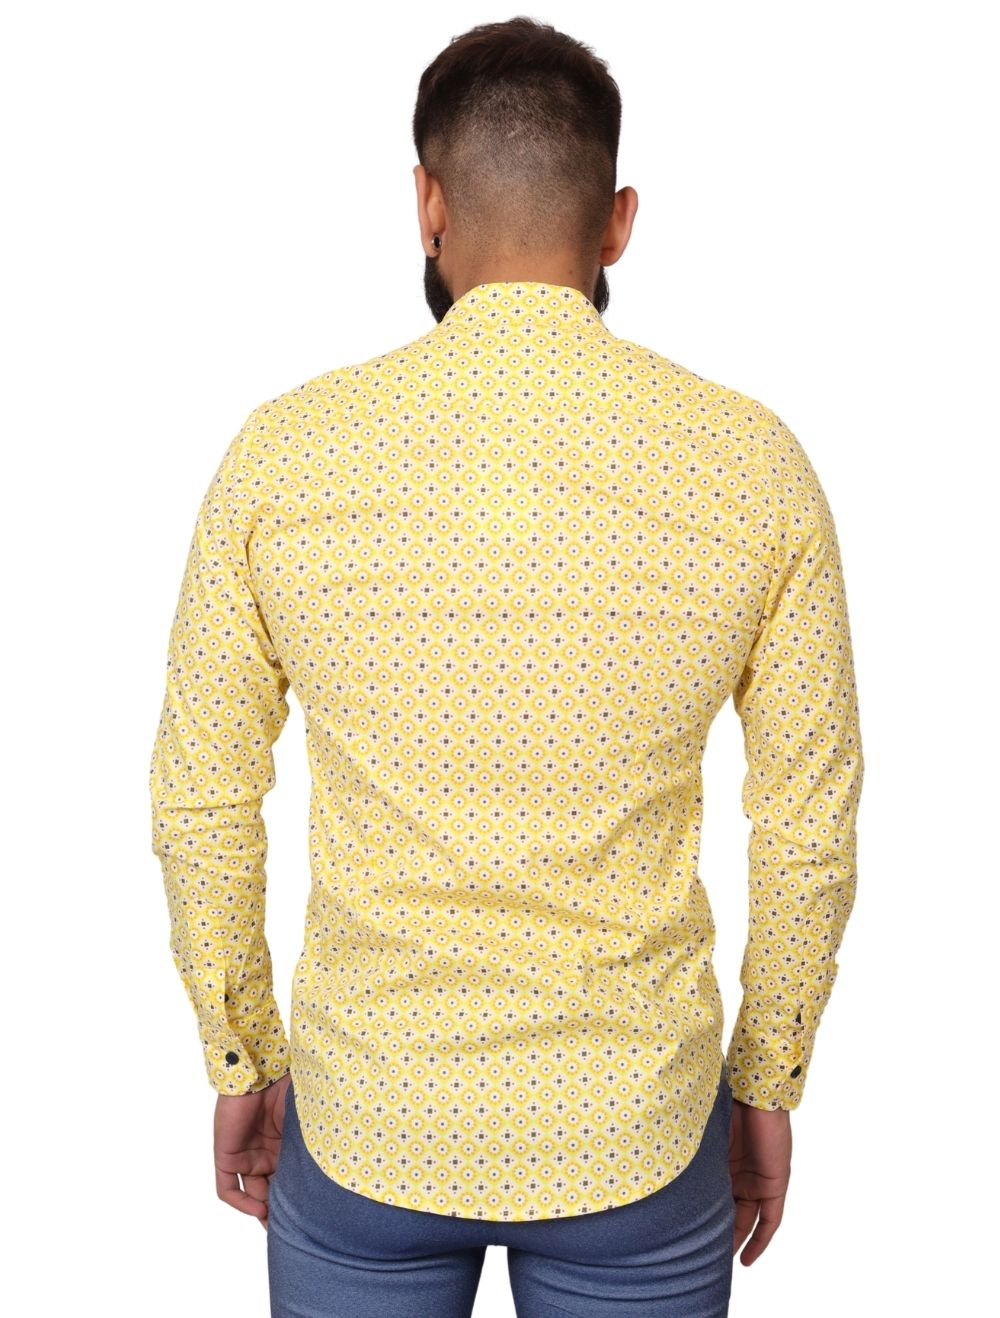 Camisa Masculina Slim Manga Longa com Elastano Amarela